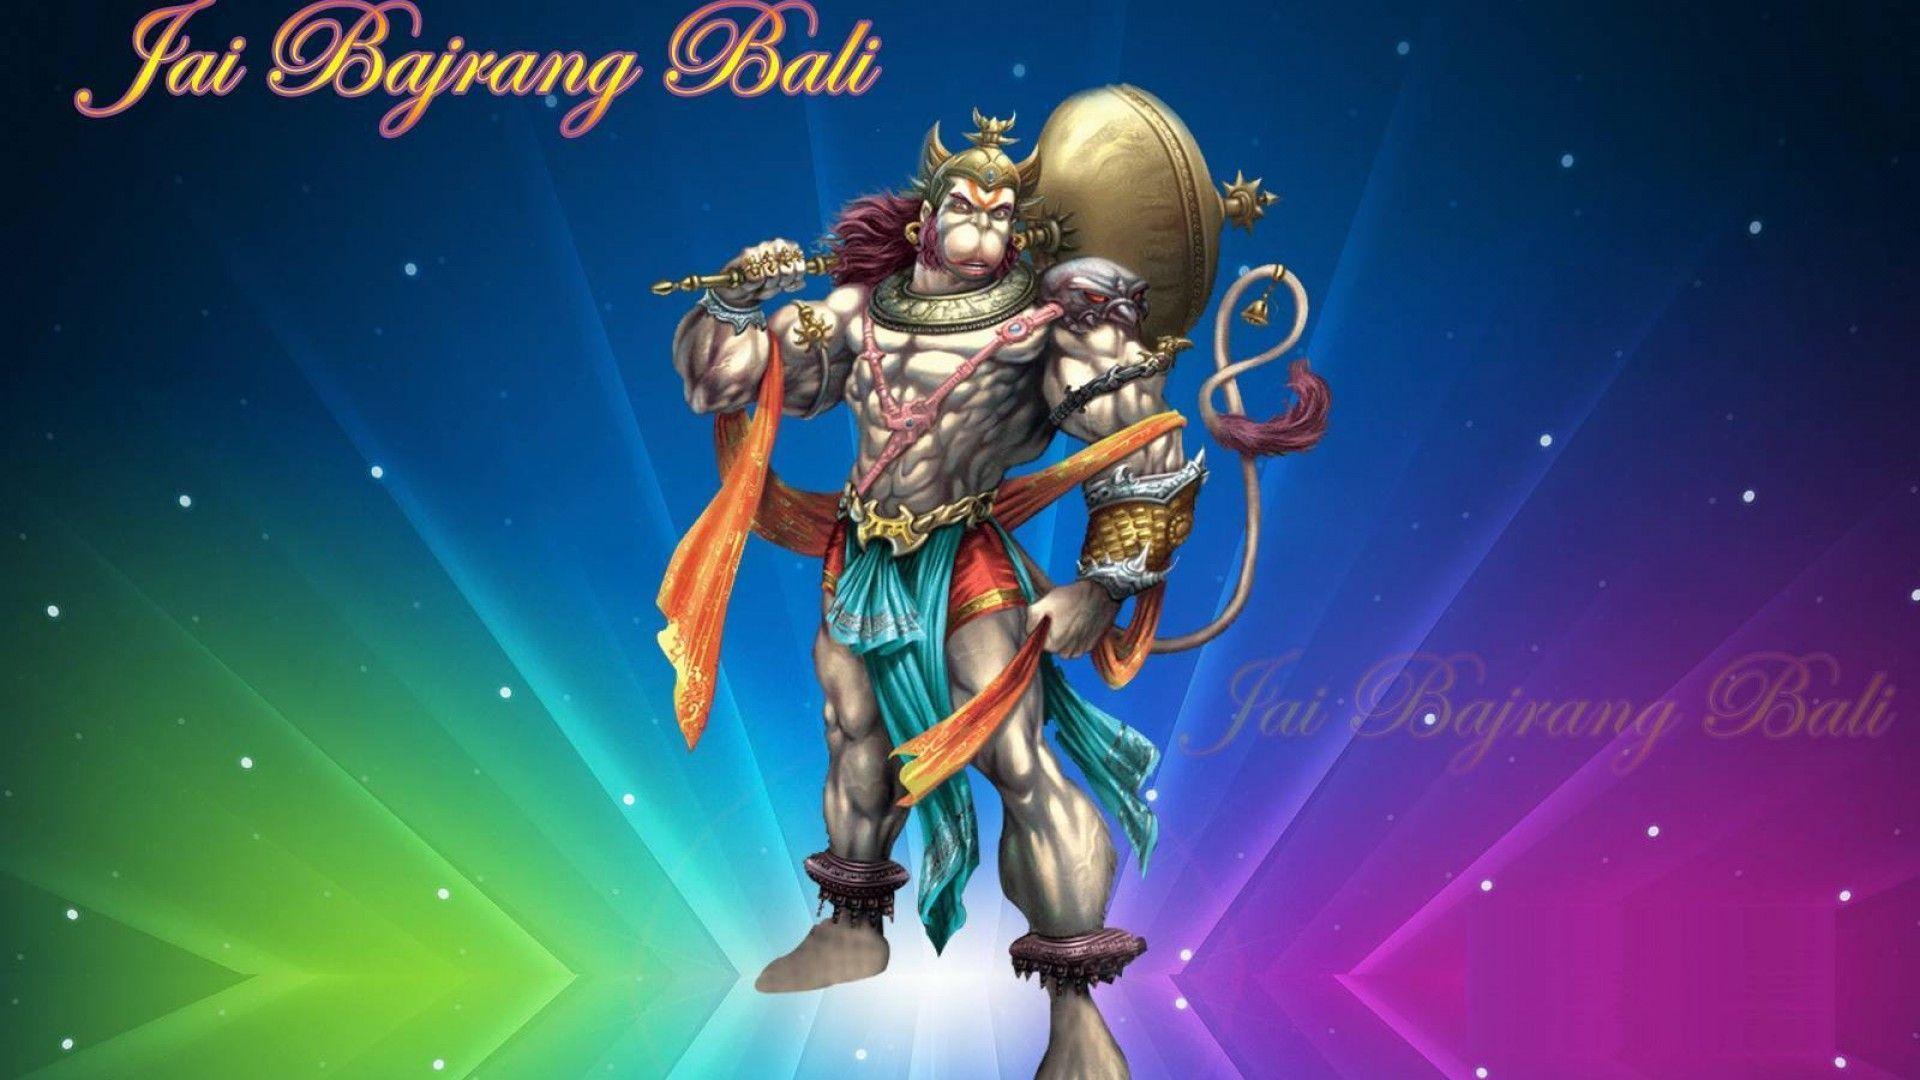 Lord Hanuman 463521 Hd Wallpaper Backgrounds Download